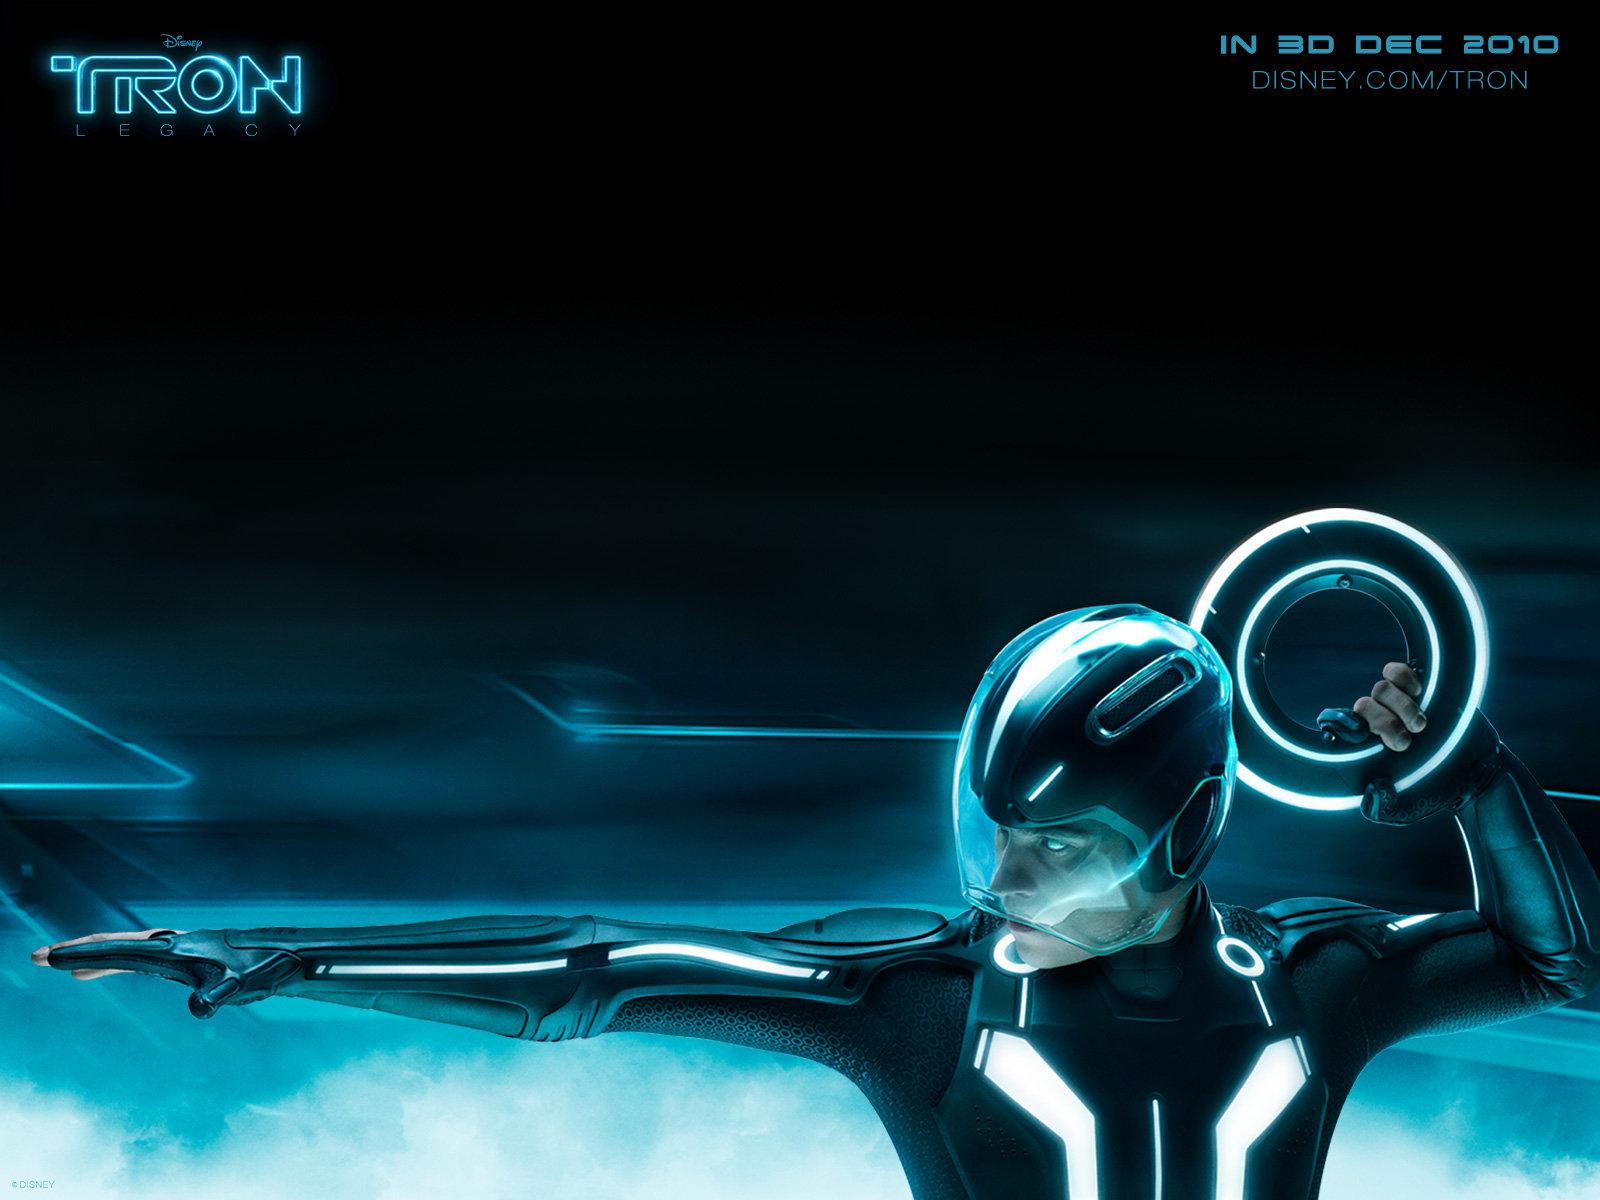 http://1.bp.blogspot.com/_nD_YgZuOadA/TJEj3qkf1SI/AAAAAAAAAuY/ByDQJUvHCGU/s1600/tron_legacy11.jpg